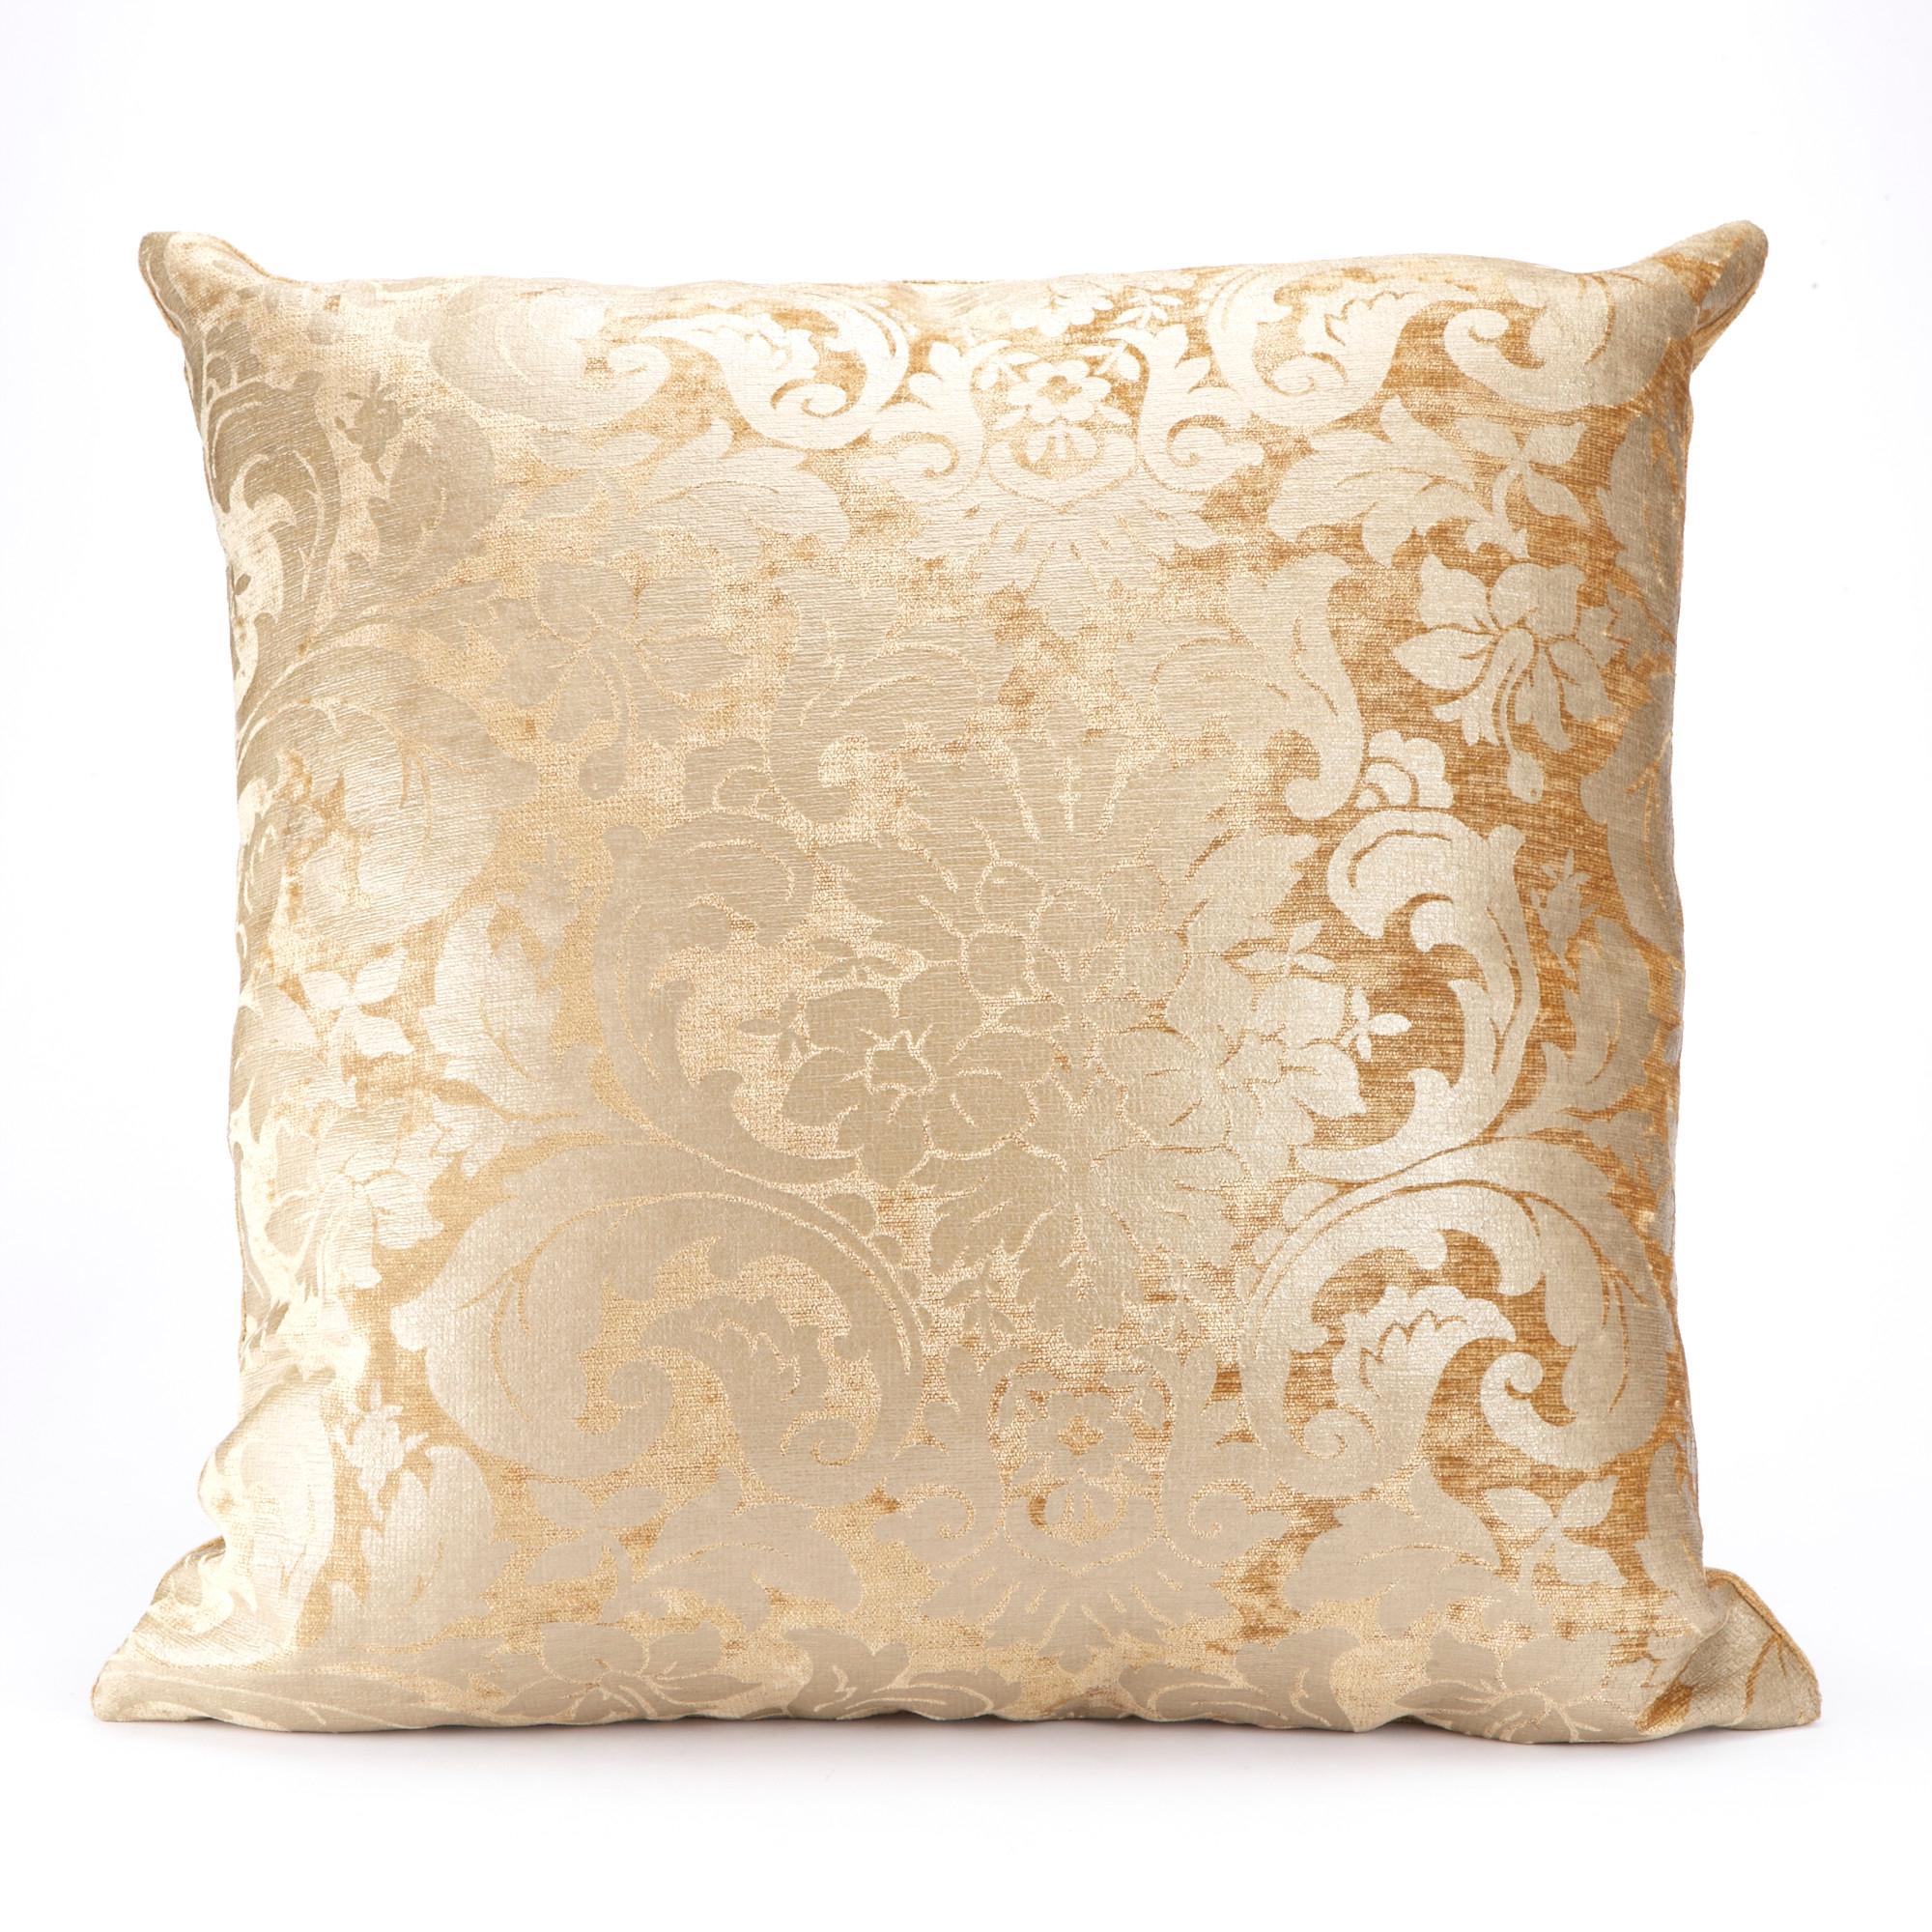 Throw Pillows Home : Park Avenue Pillows Gump s